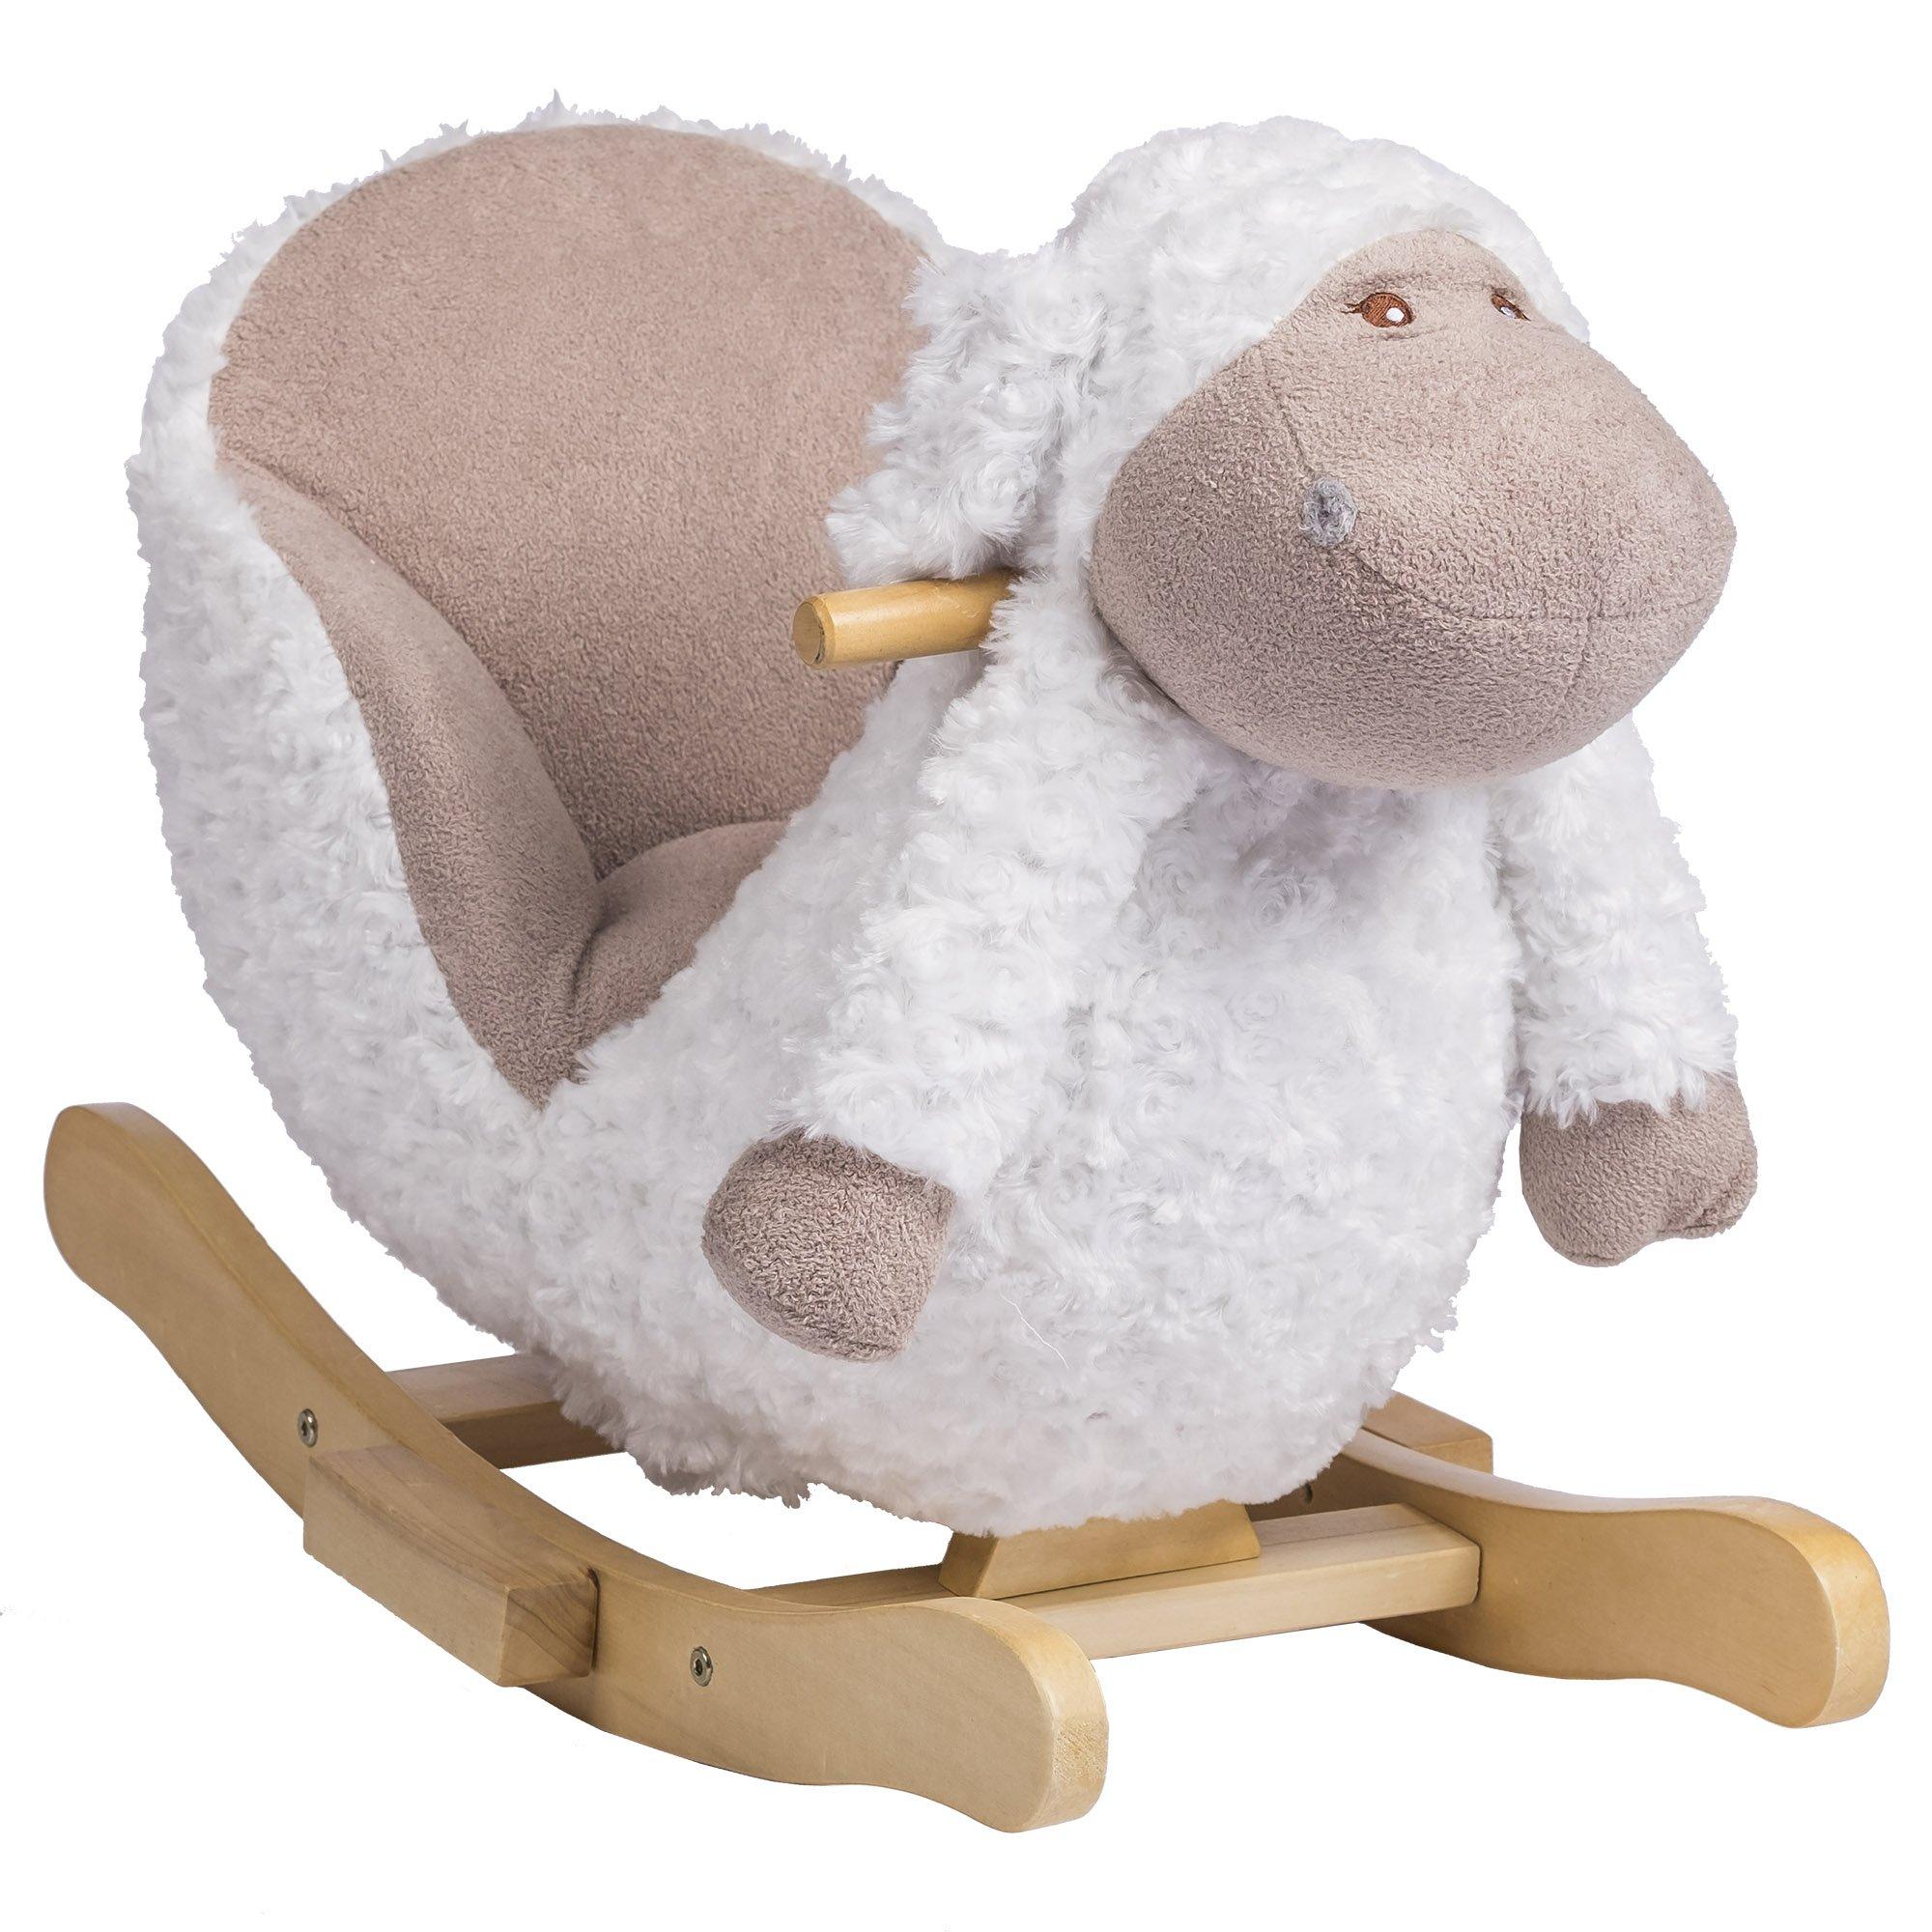 Rockin' Rider Bashful The Lamb Baby Rocker Plush Ride-On, White